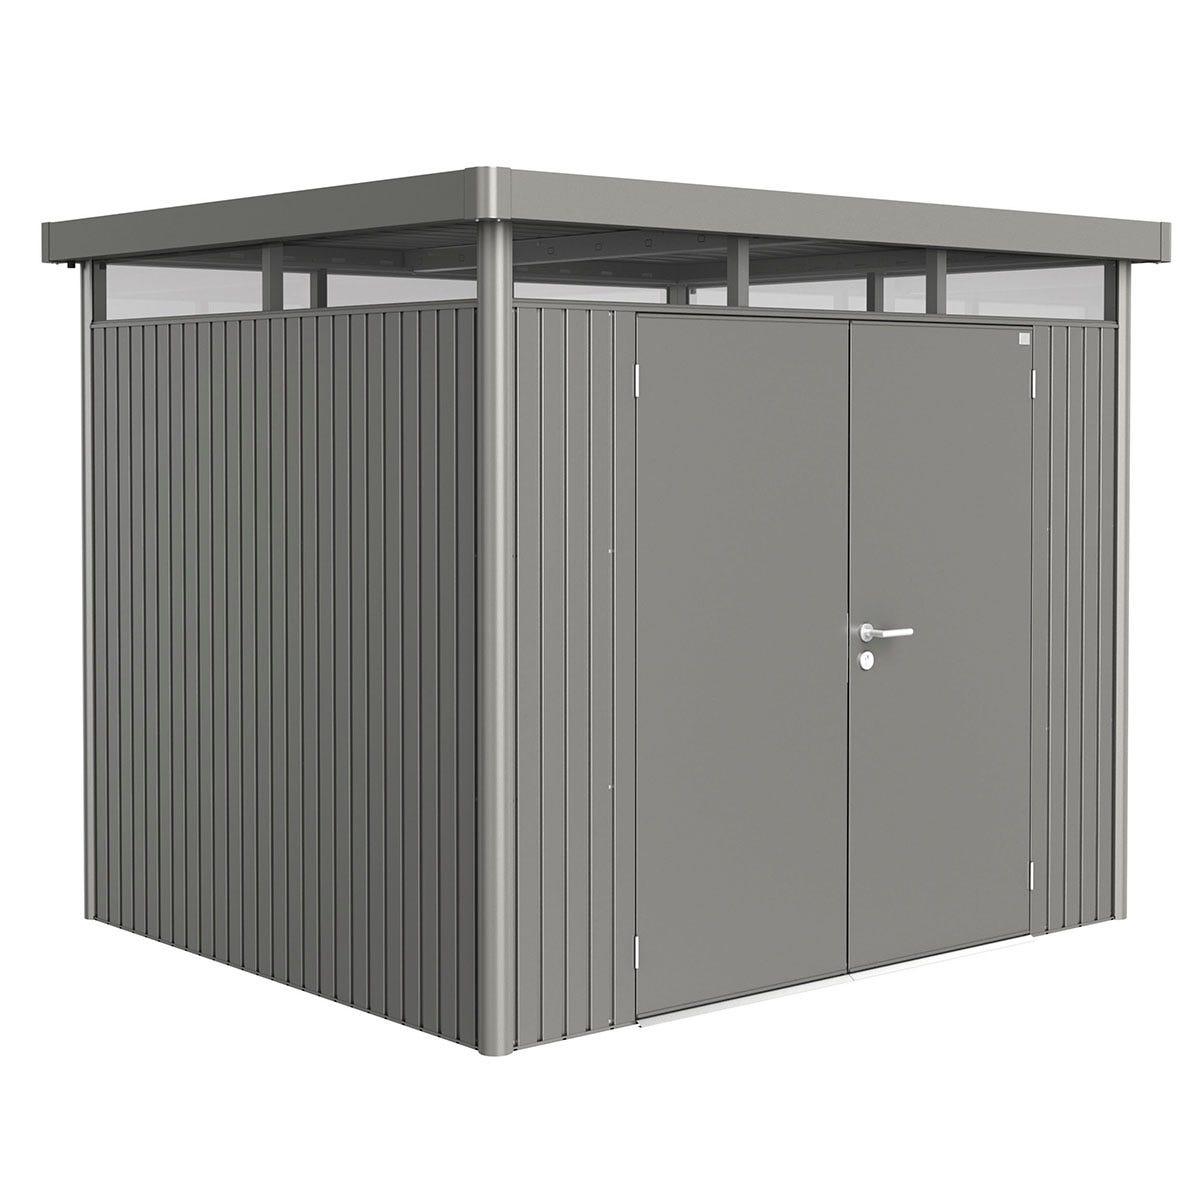 Biohort Highline Metal Shed H3 Double door 9 x 8 - Quartz Grey